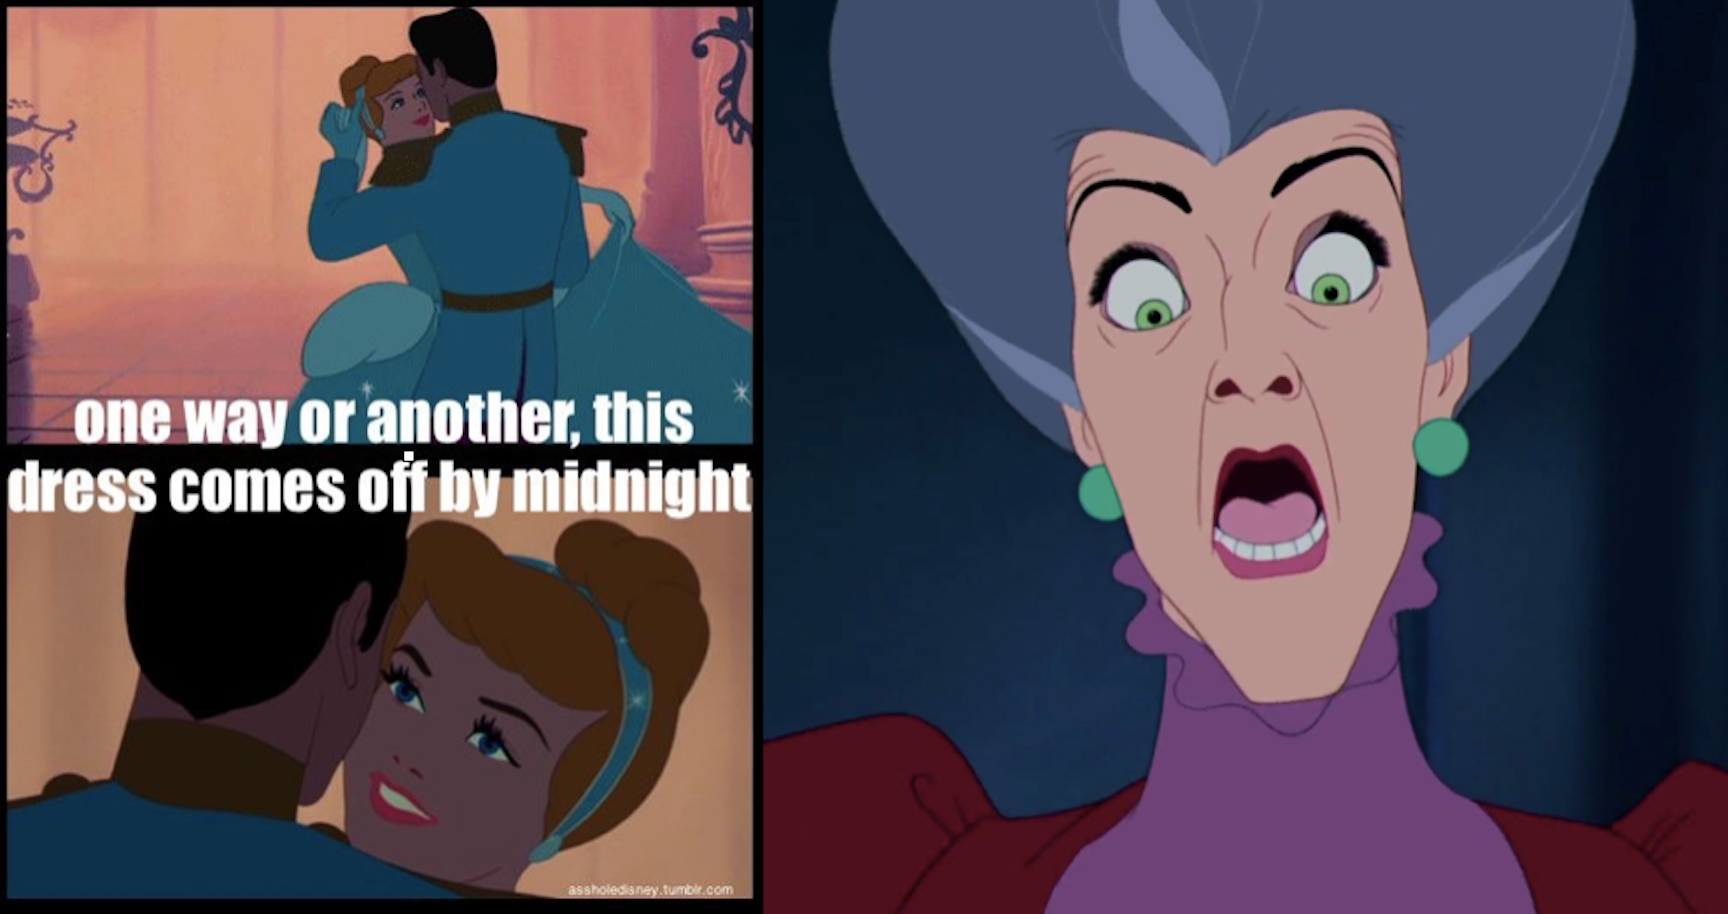 15 Hilarious Disney Memes That'll Make You Rethink Everything